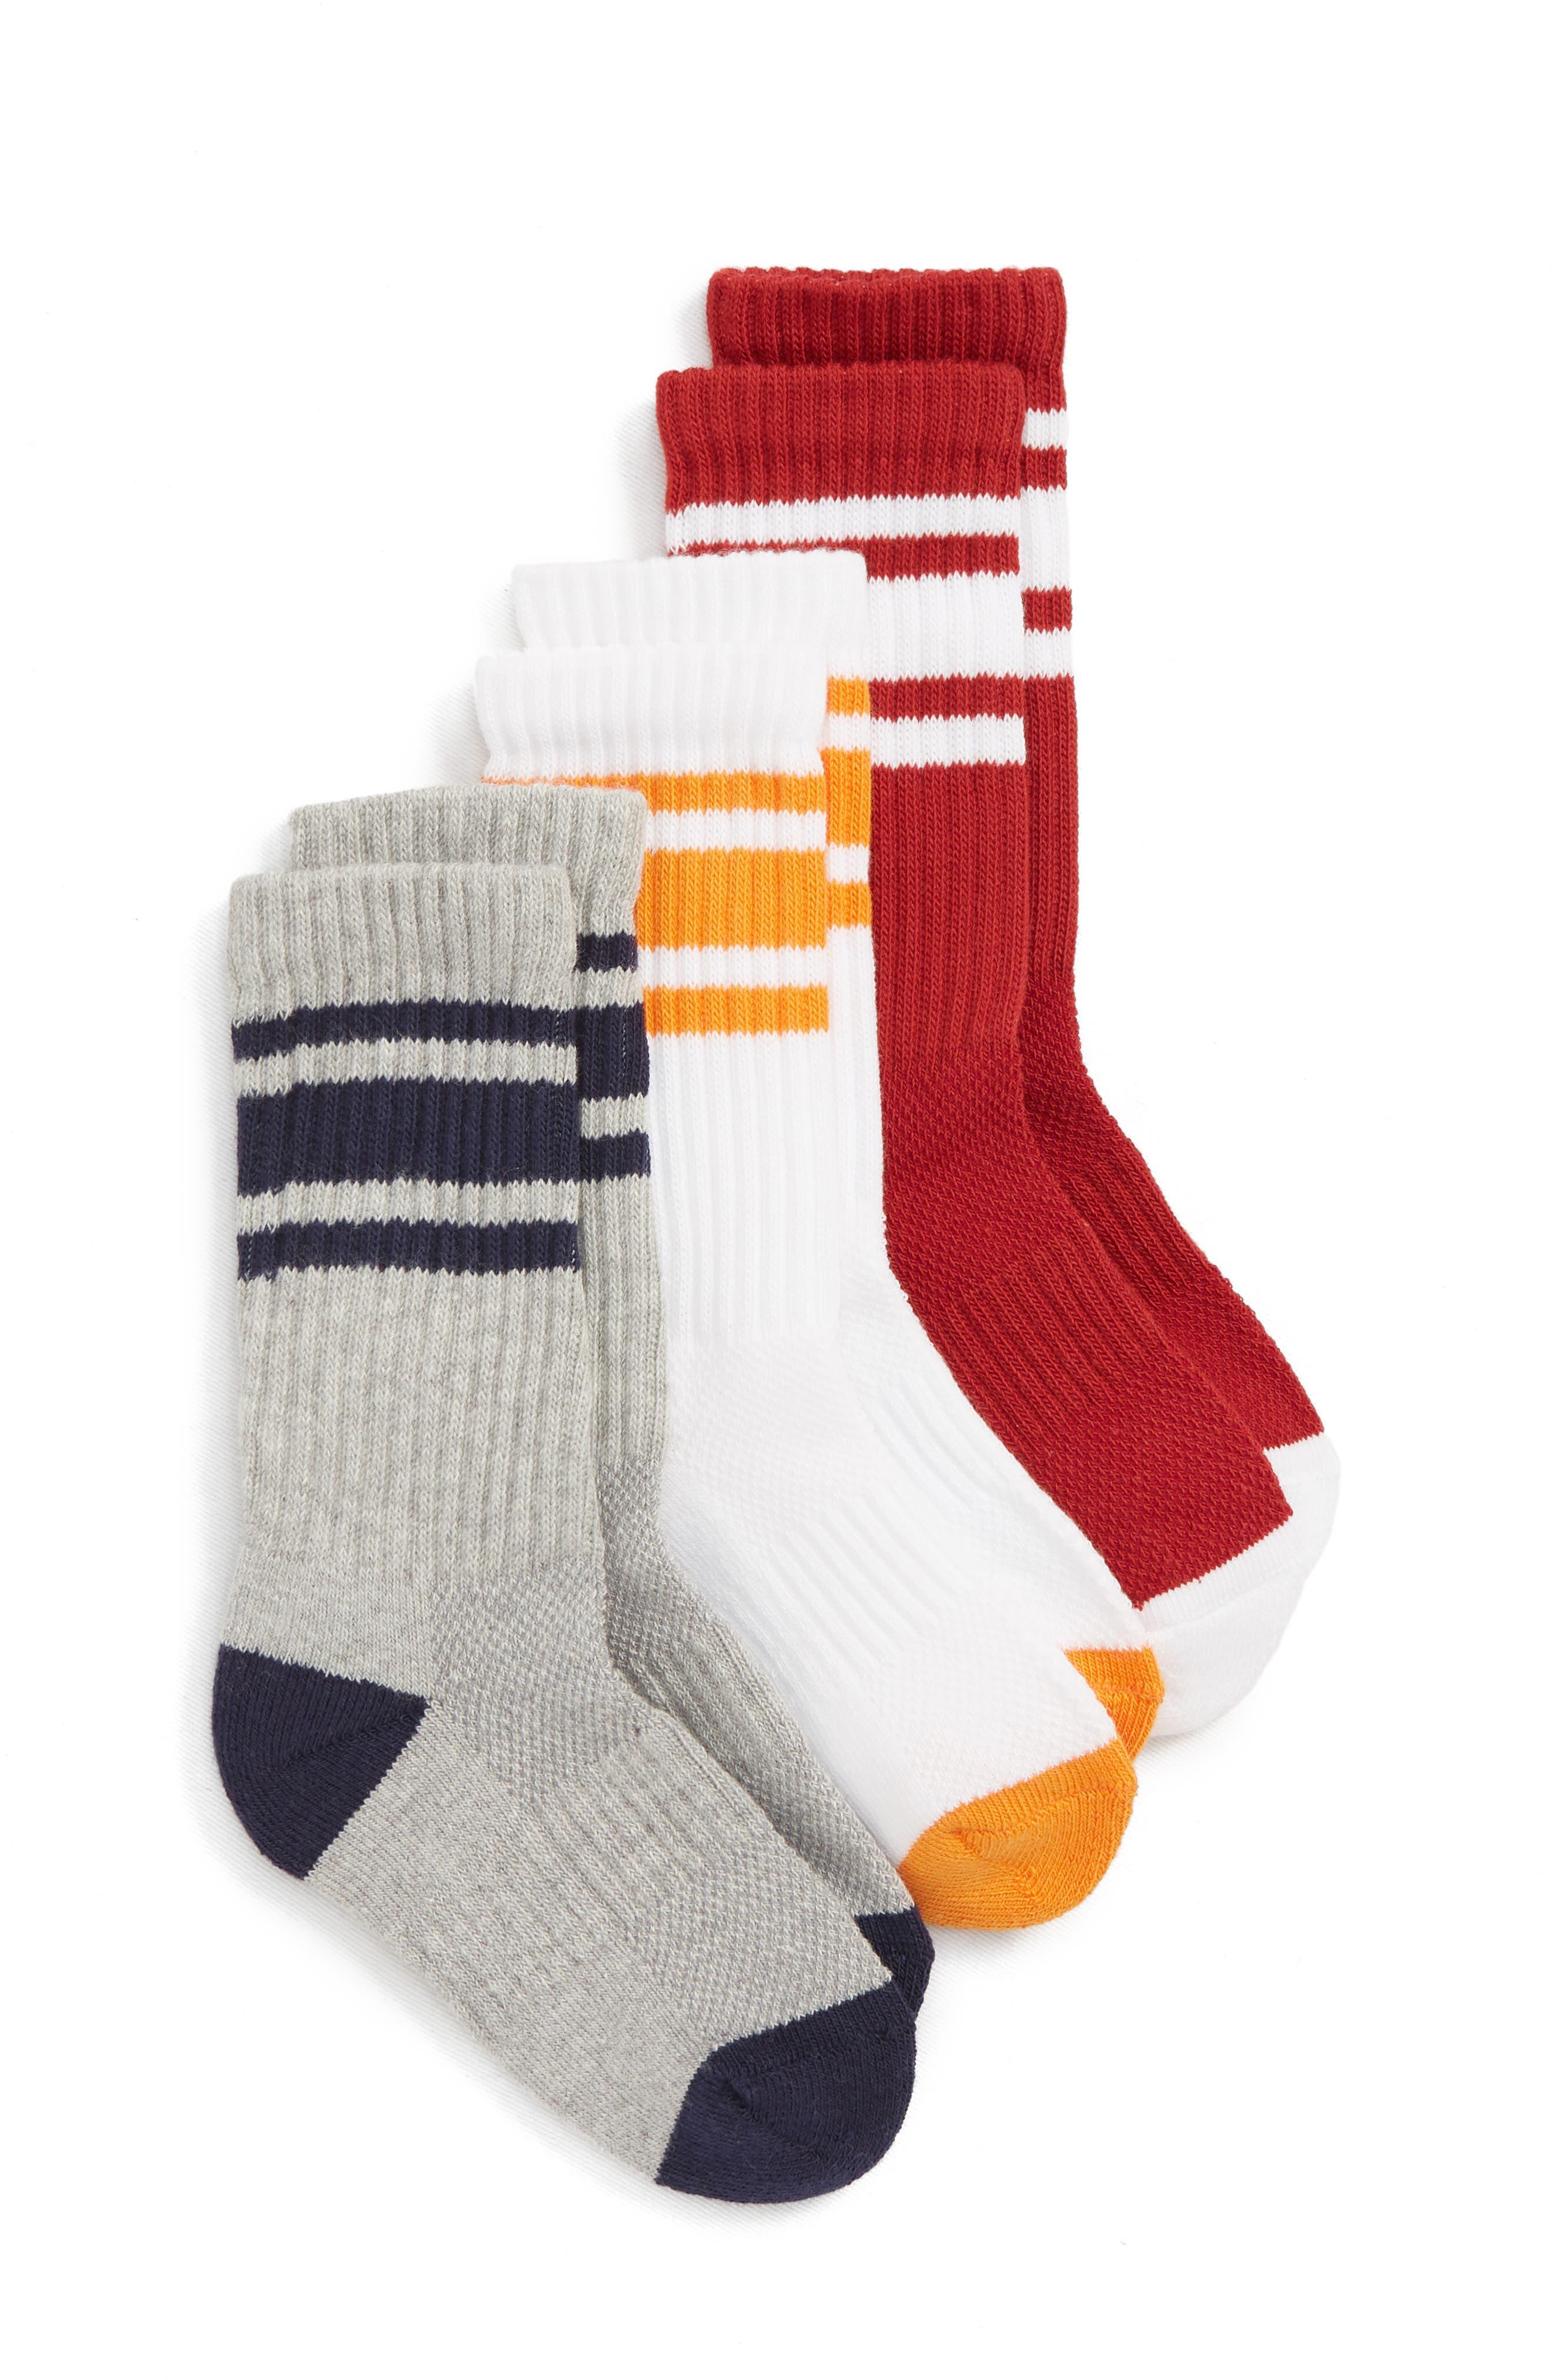 3-Pack Tube Socks,                             Main thumbnail 1, color,                             NAVY PEACOAT MULTI